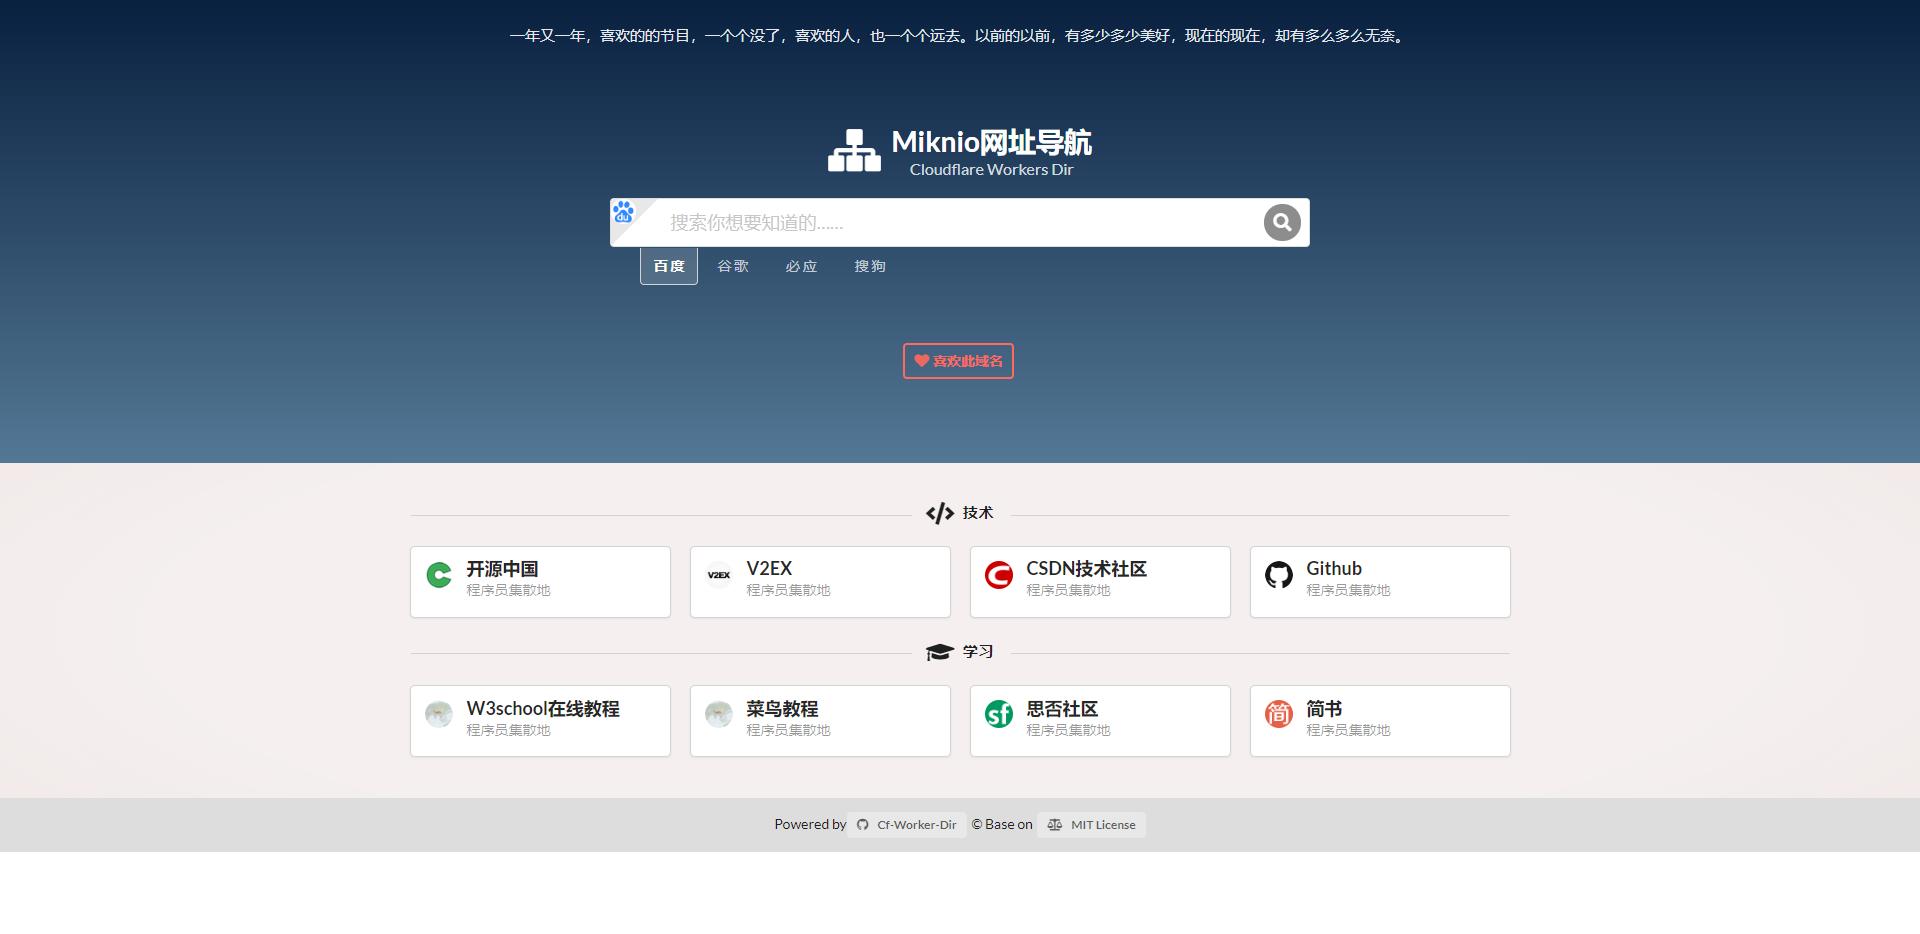 使用Cloudflare Worker平台搭建一个免费的网站导航-常网小站Miknio